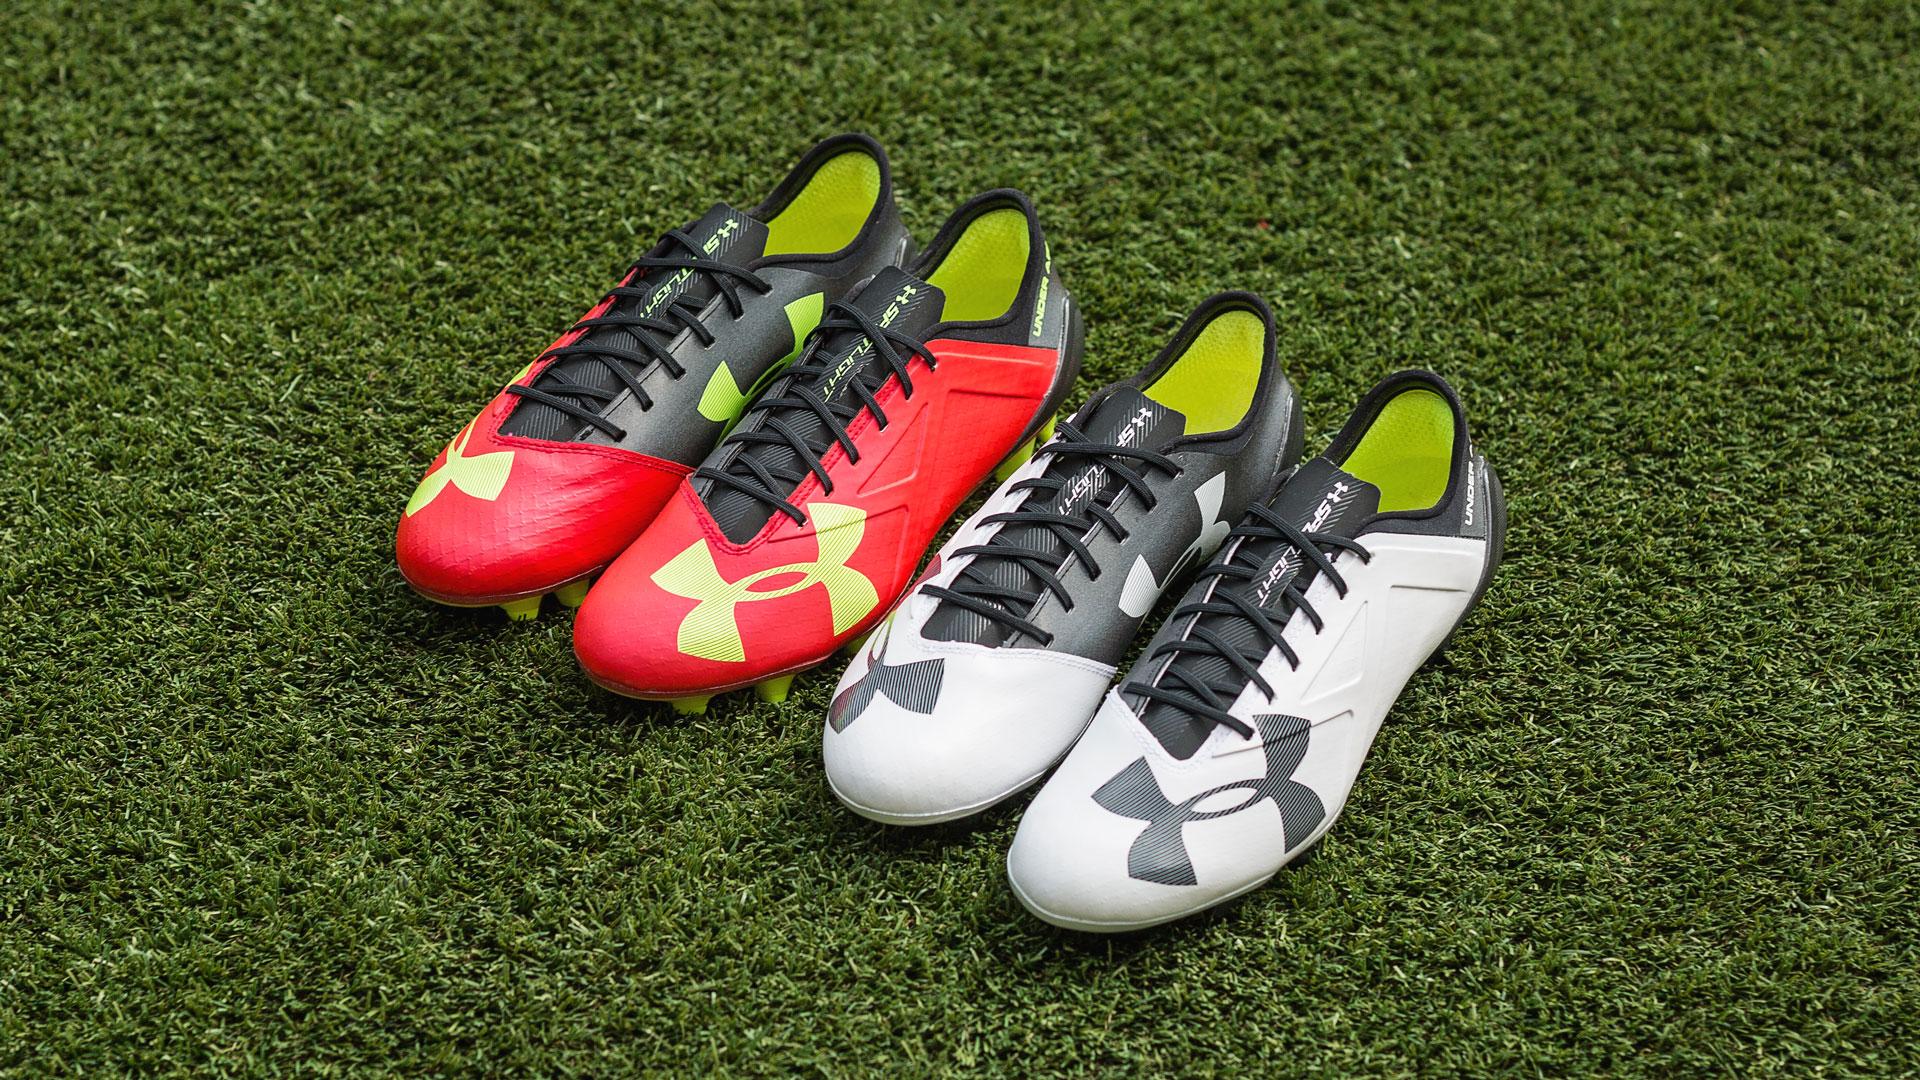 24798034c9e Meet the new Under Armour Spotlight football boot!